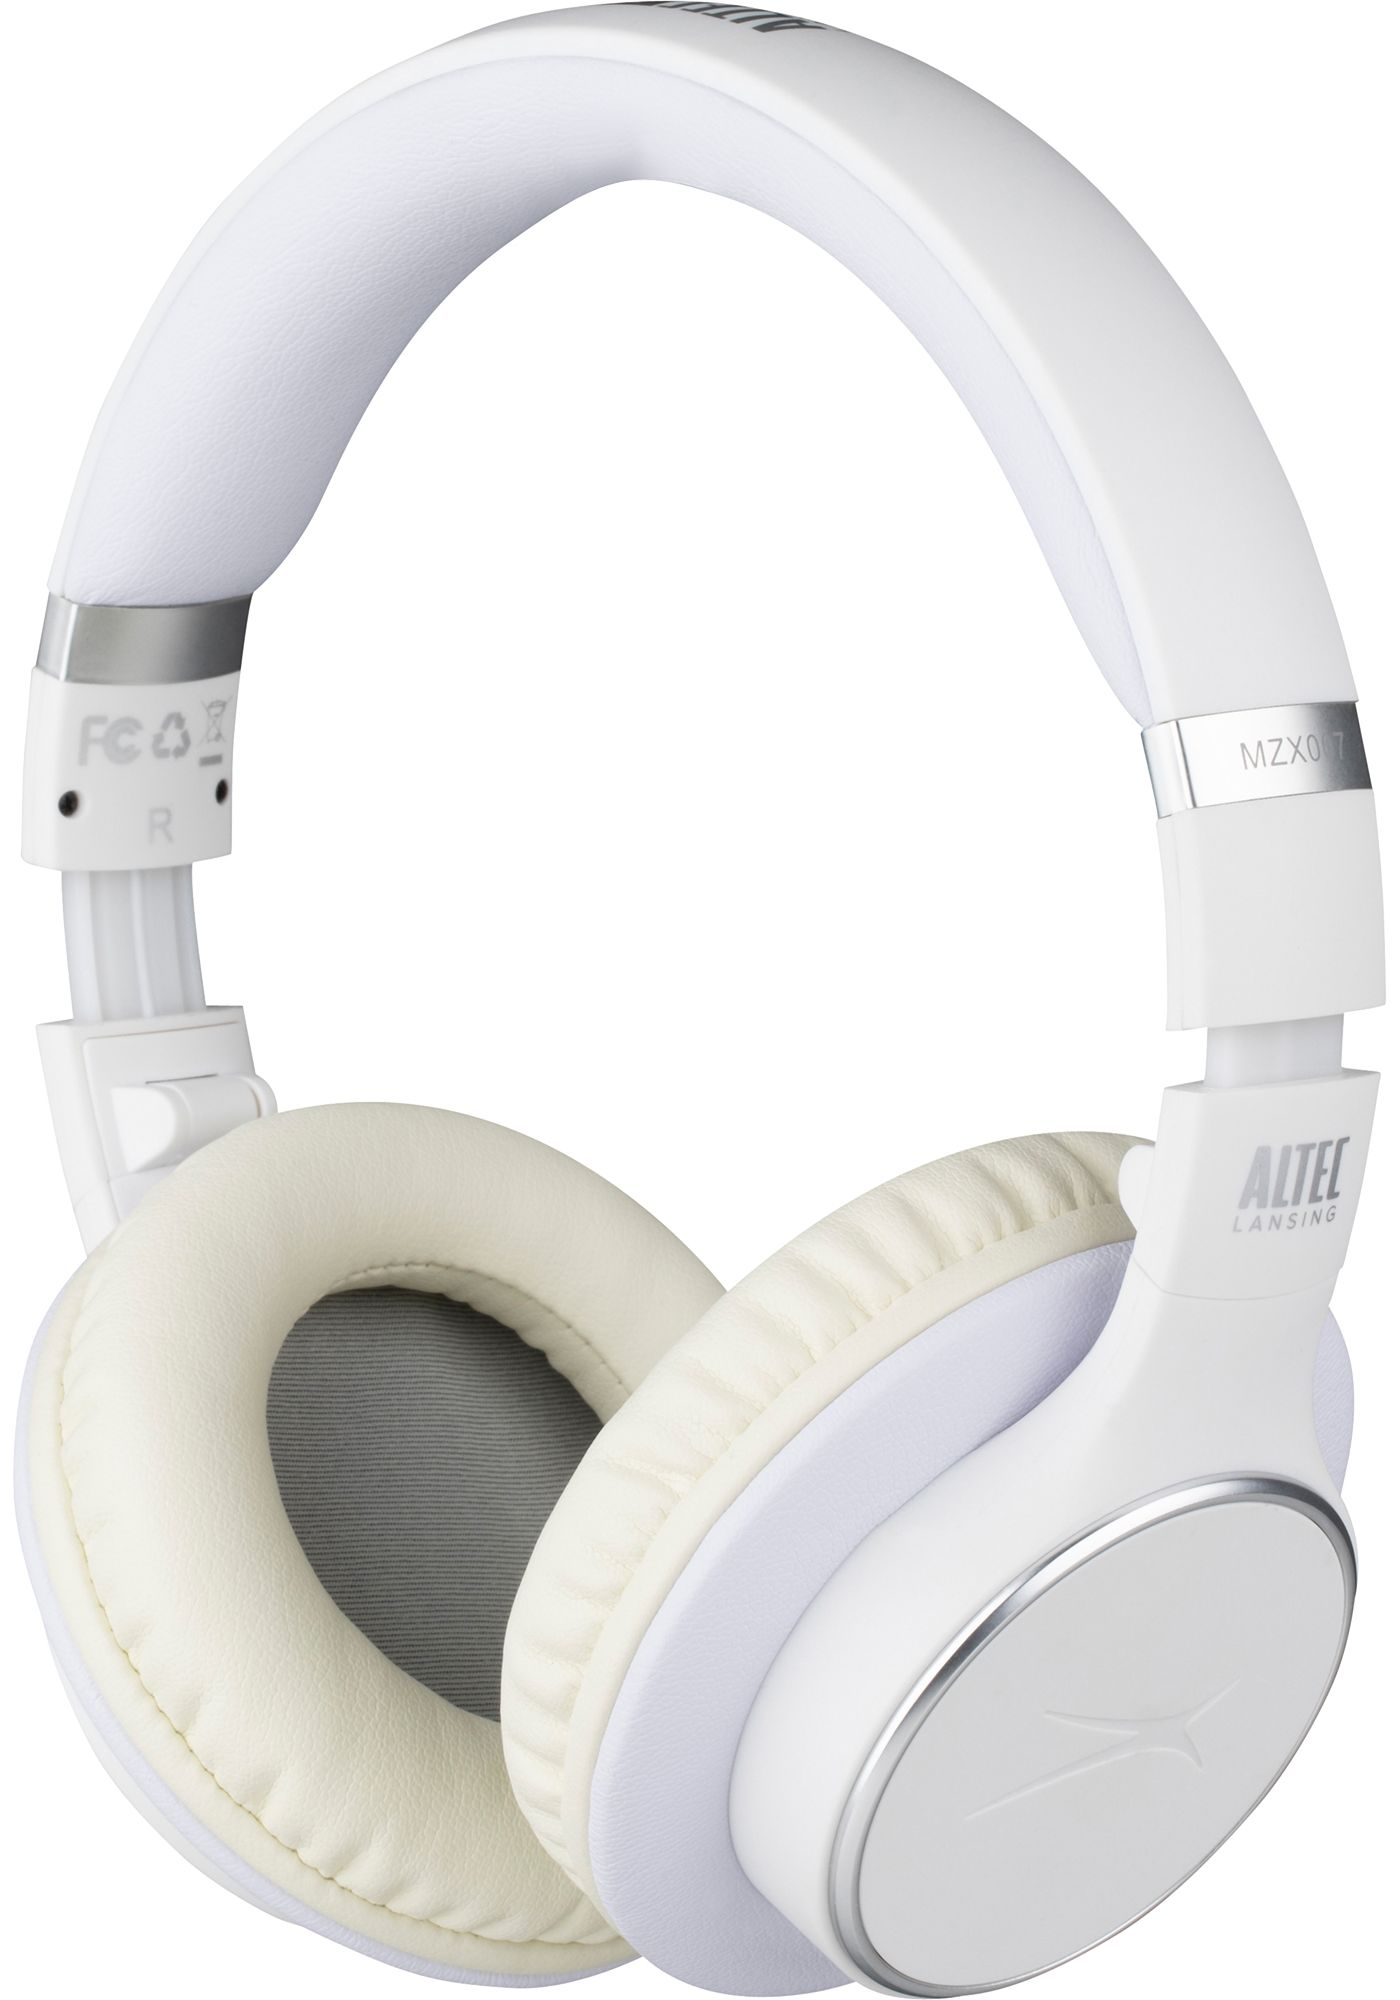 Altec Lansing 007 Bluetooth Headphones